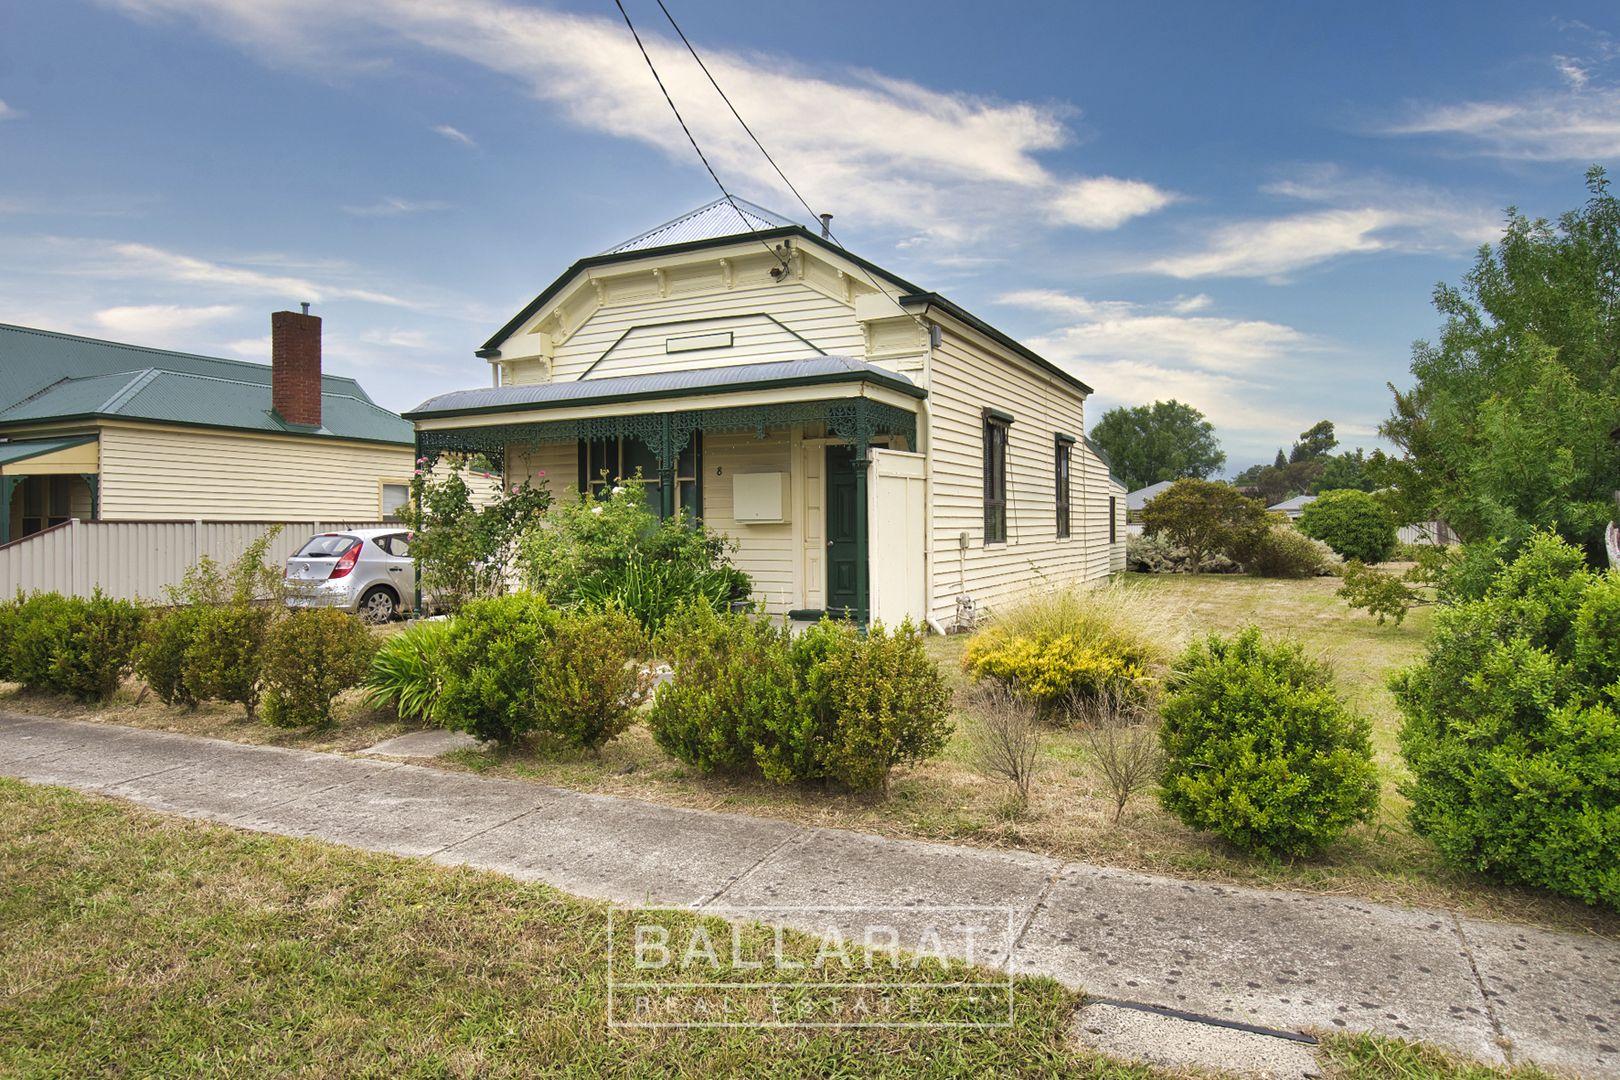 8 Rice Street, Ballarat East VIC 3350, Image 0